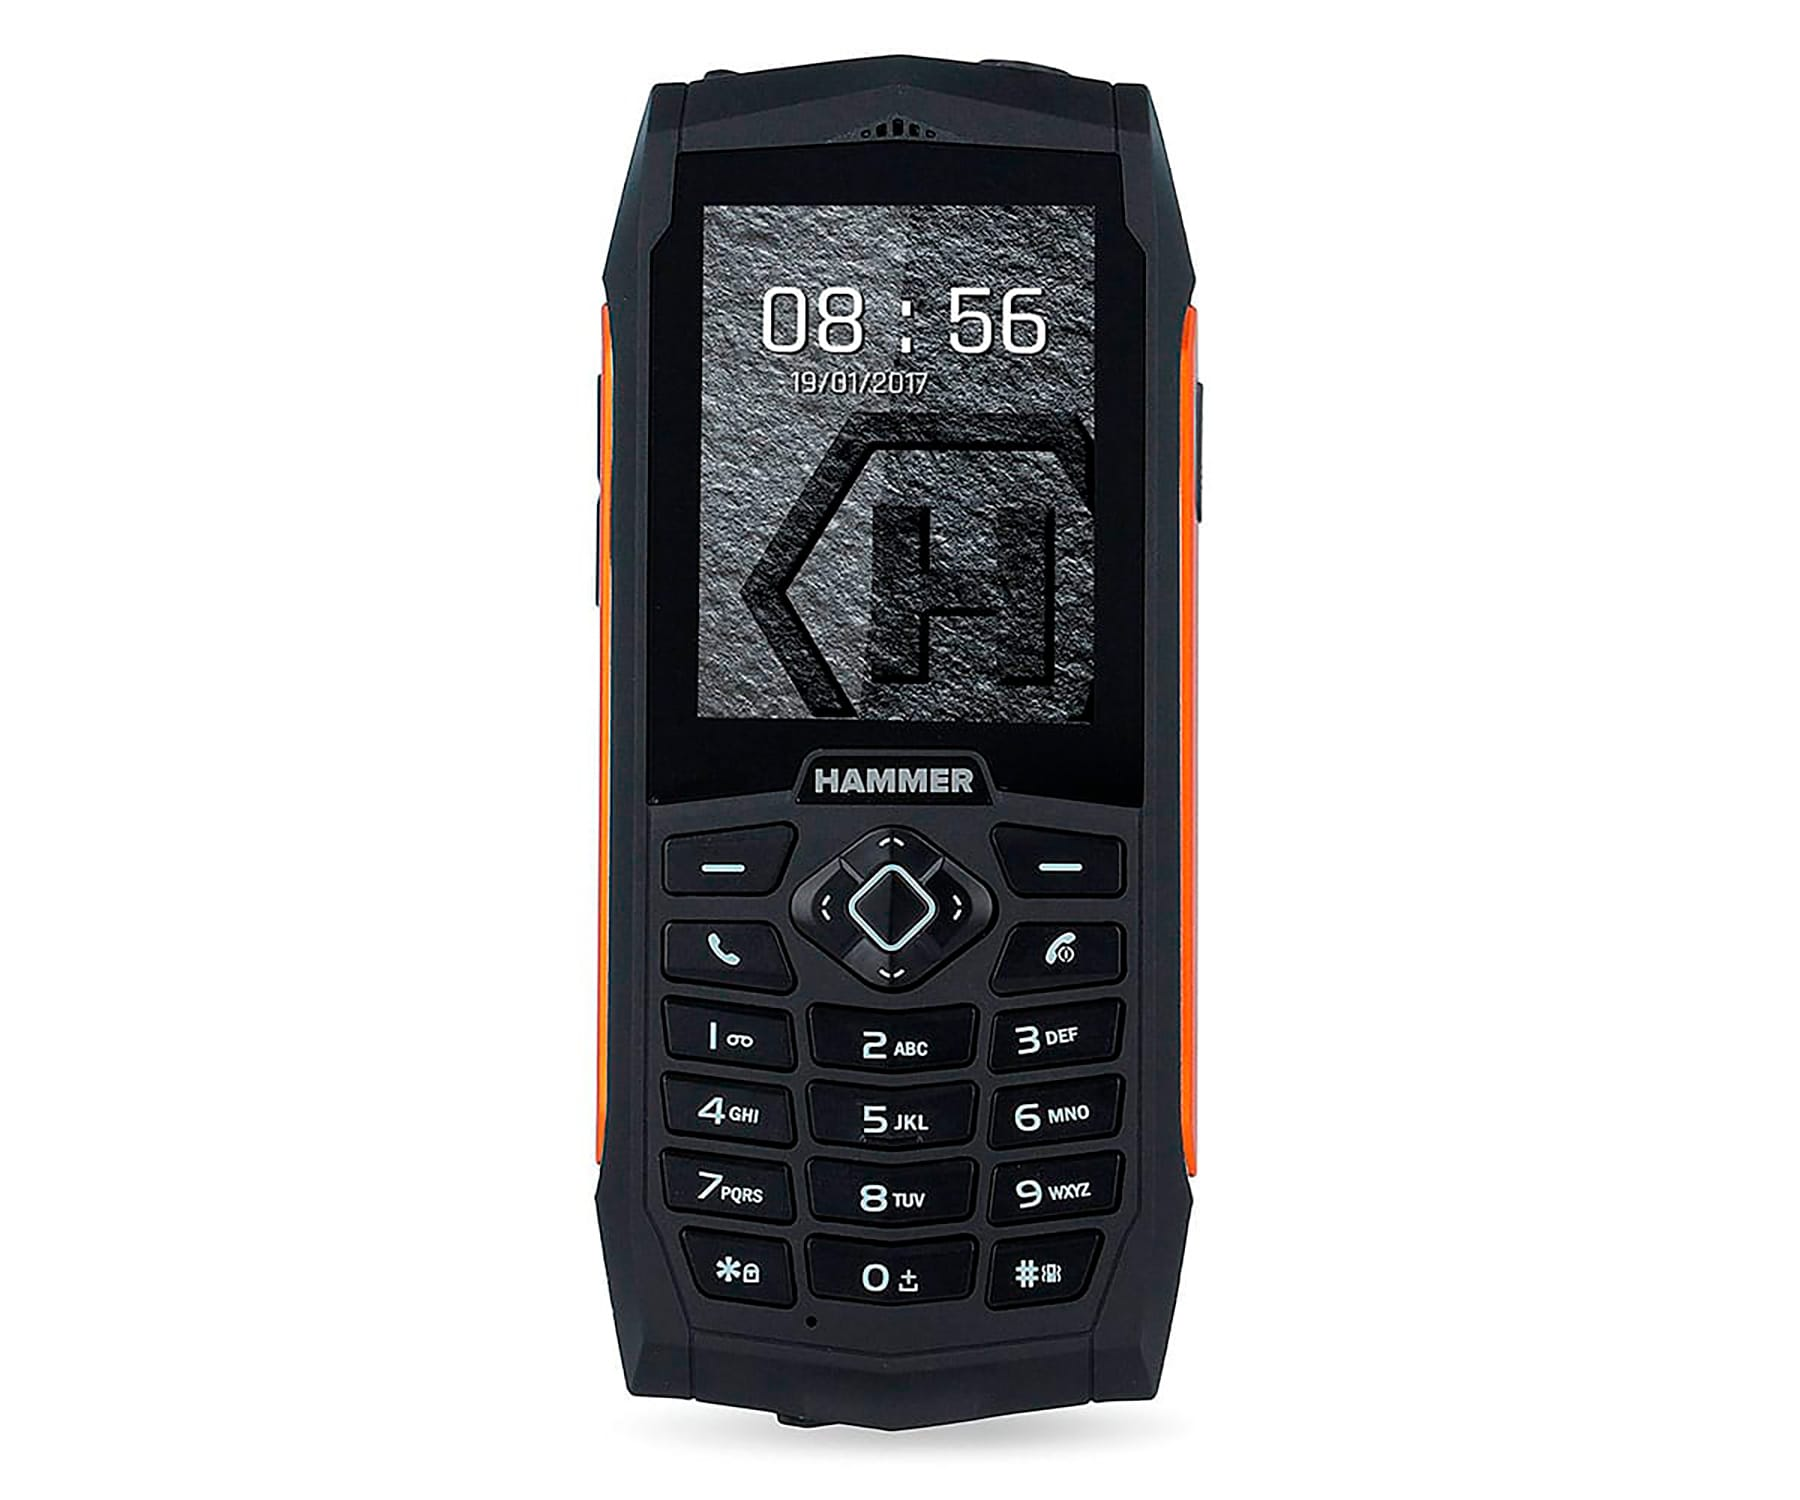 MYPHONE HAMMER 3 NEGRO NARANJA MÓVIL RESISTENTE IP68 DUAL SIM 2.4 TFT CÁMARA VGA BLUETOOTH RADIO F -